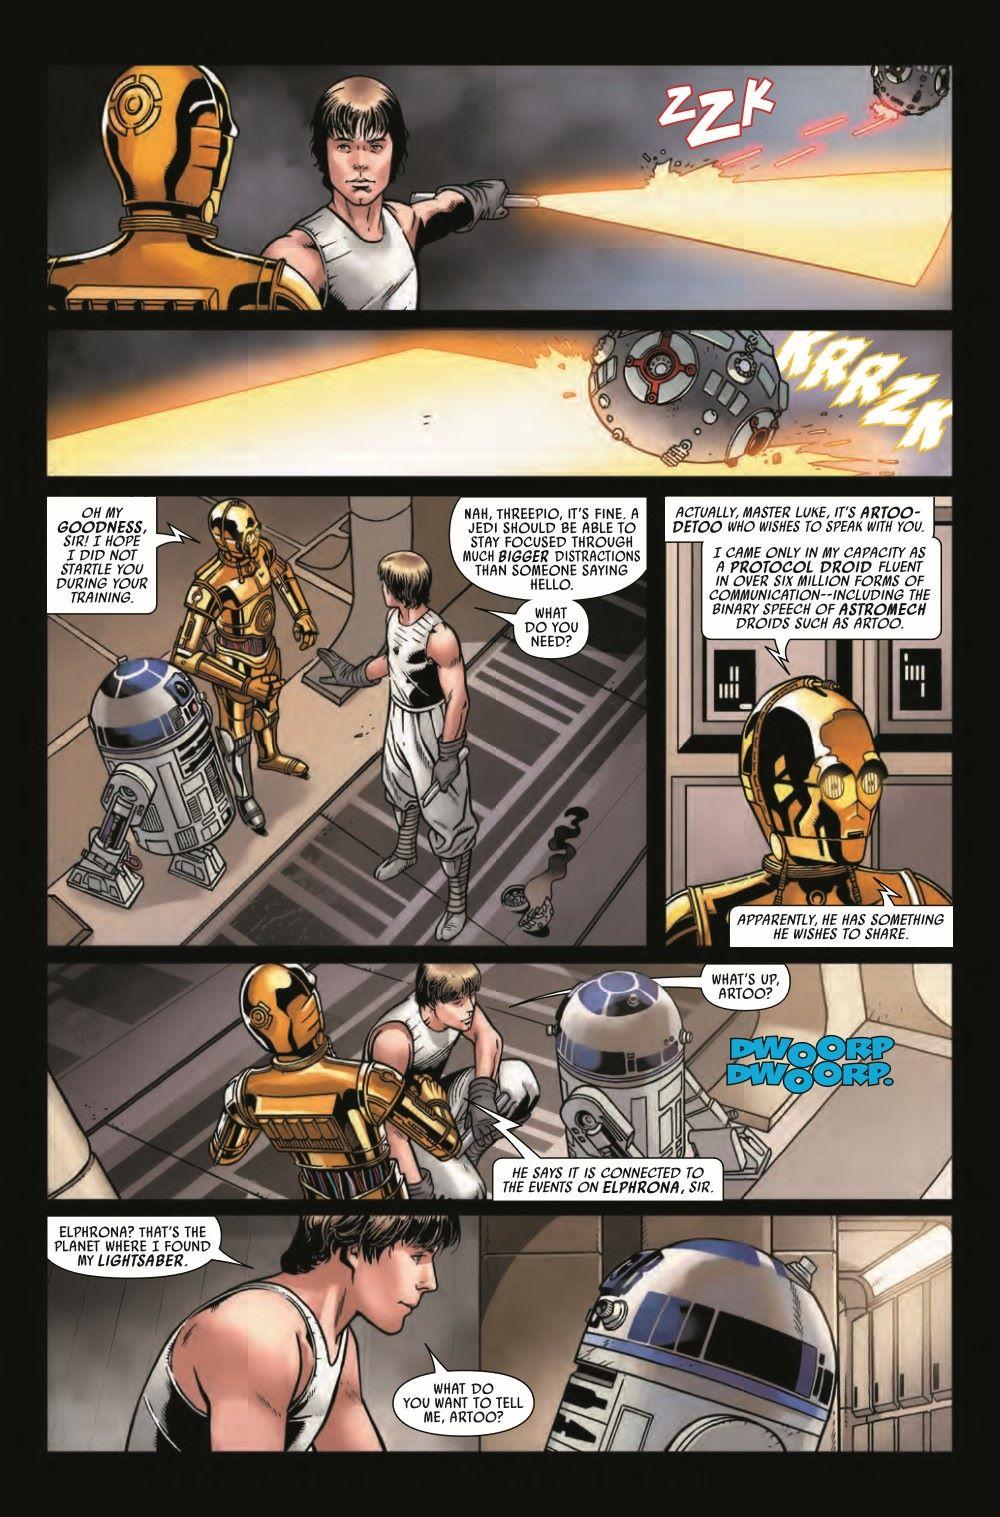 STWARS2020013_Preview-6 ComicList Previews: STAR WARS #13